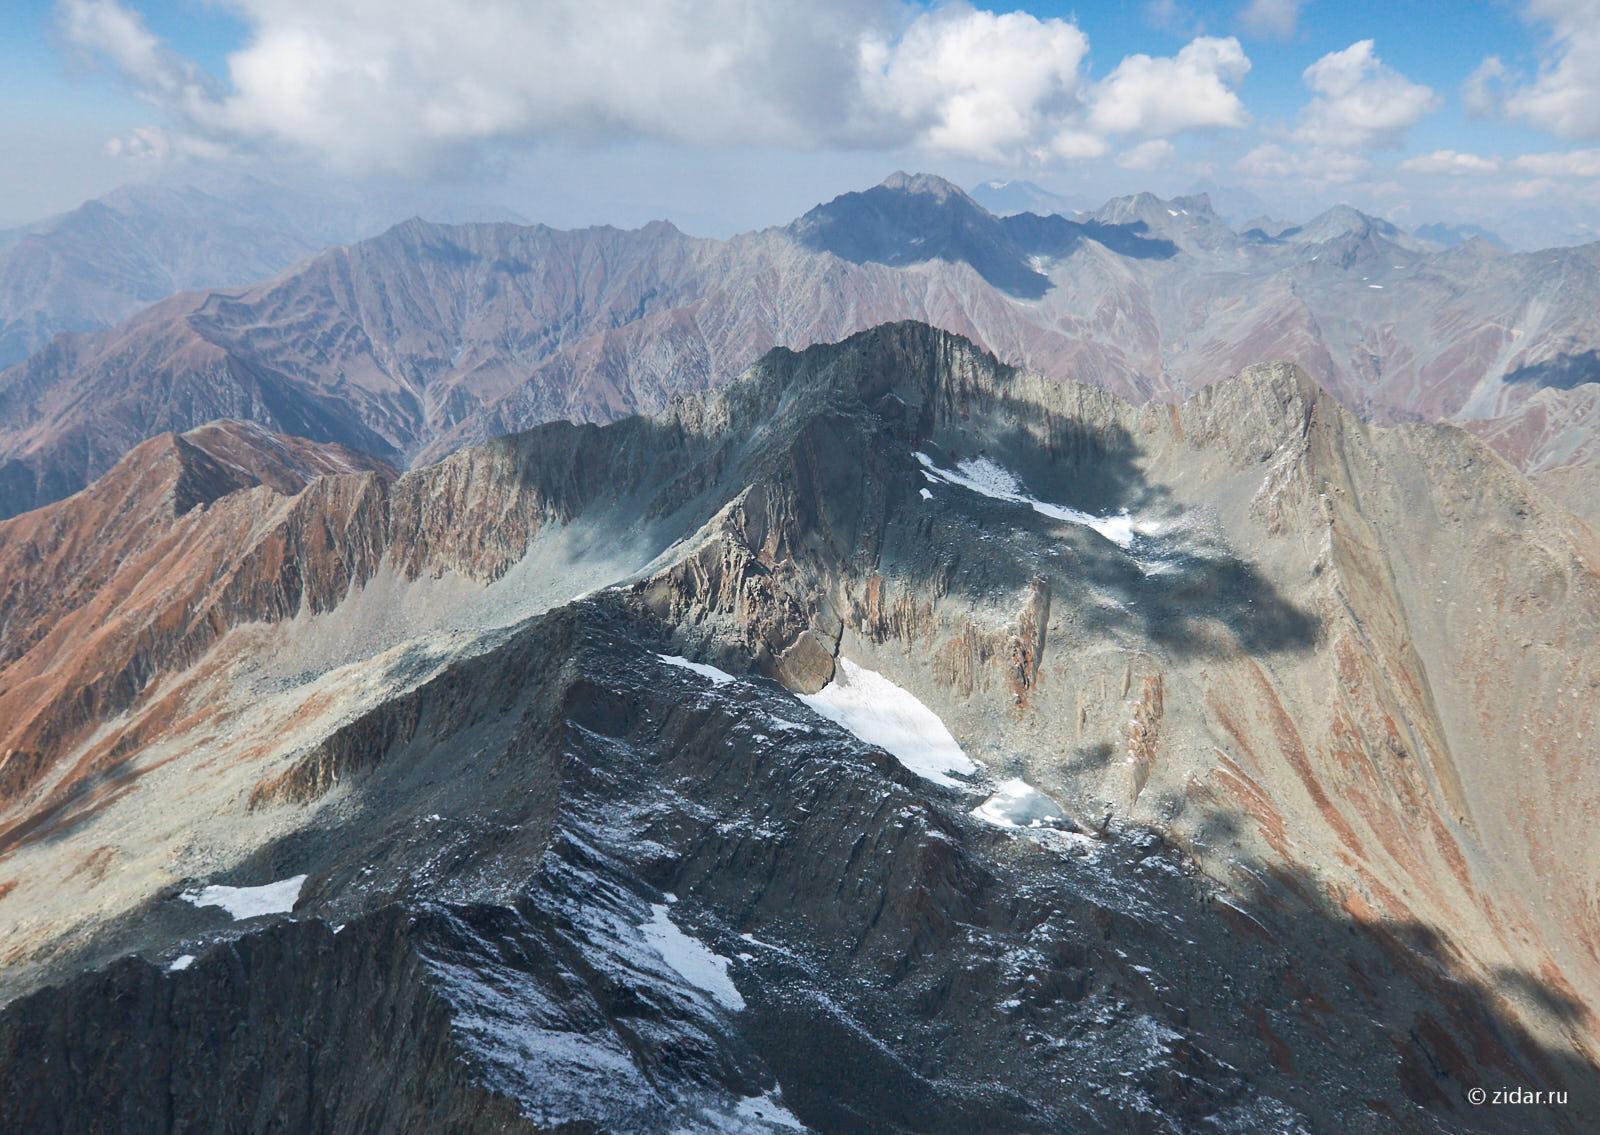 Взгляд на запад - в сторону вершины Тамсар